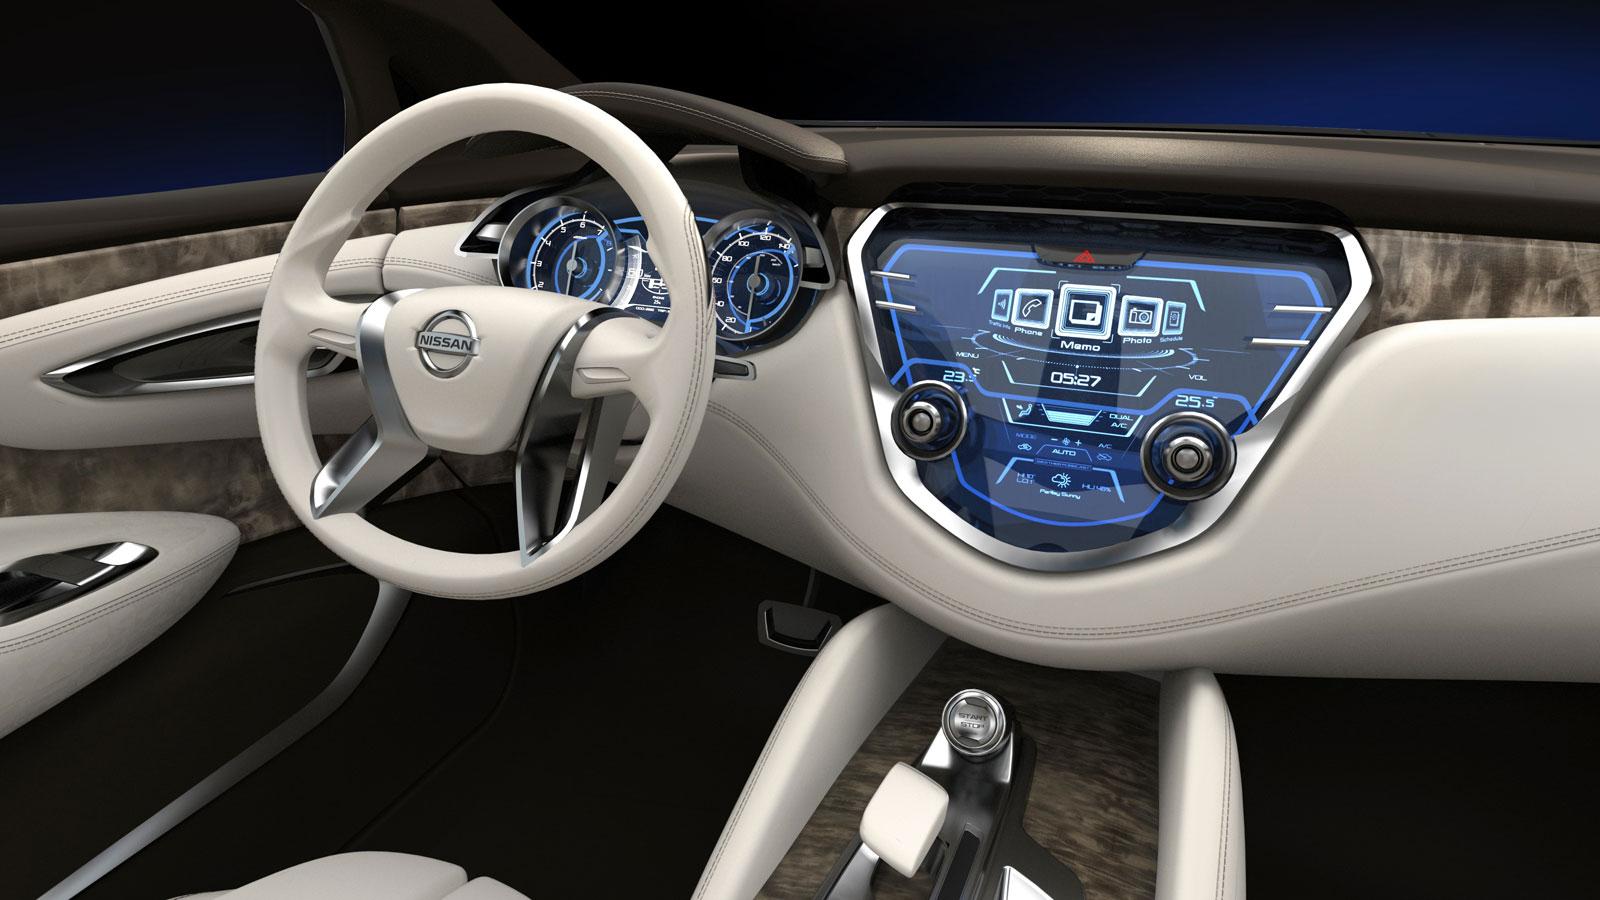 2013 Nissan Resonance - Concepts